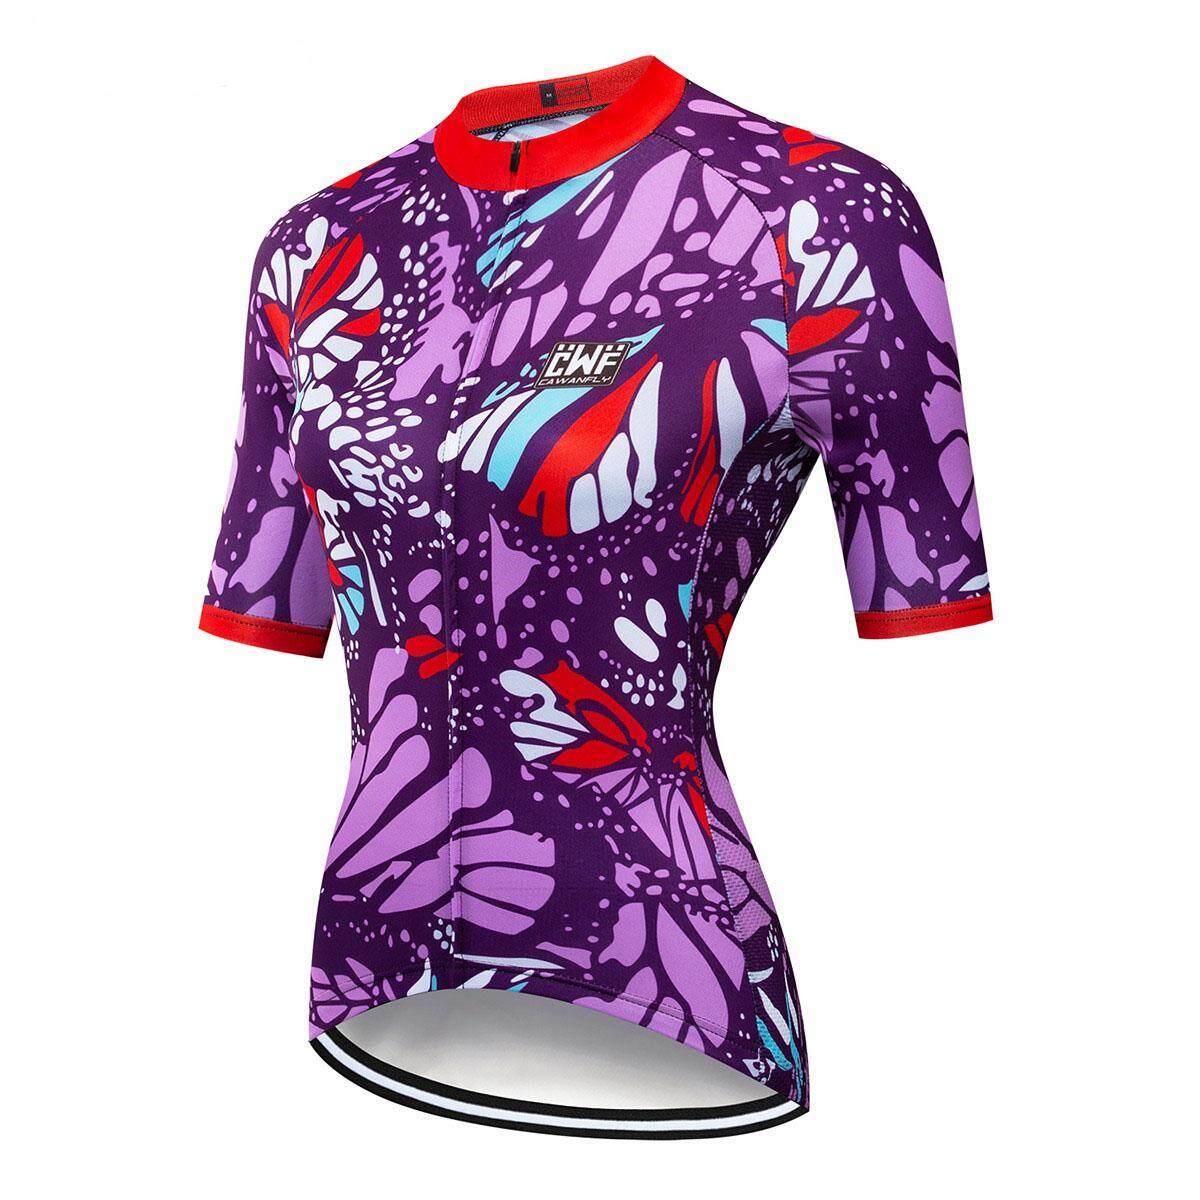 Cycling Jersey Women Bike Top Shirt Summer Short Sleeve MTB Cycling Clothing  (Red)SS16 227f2252a